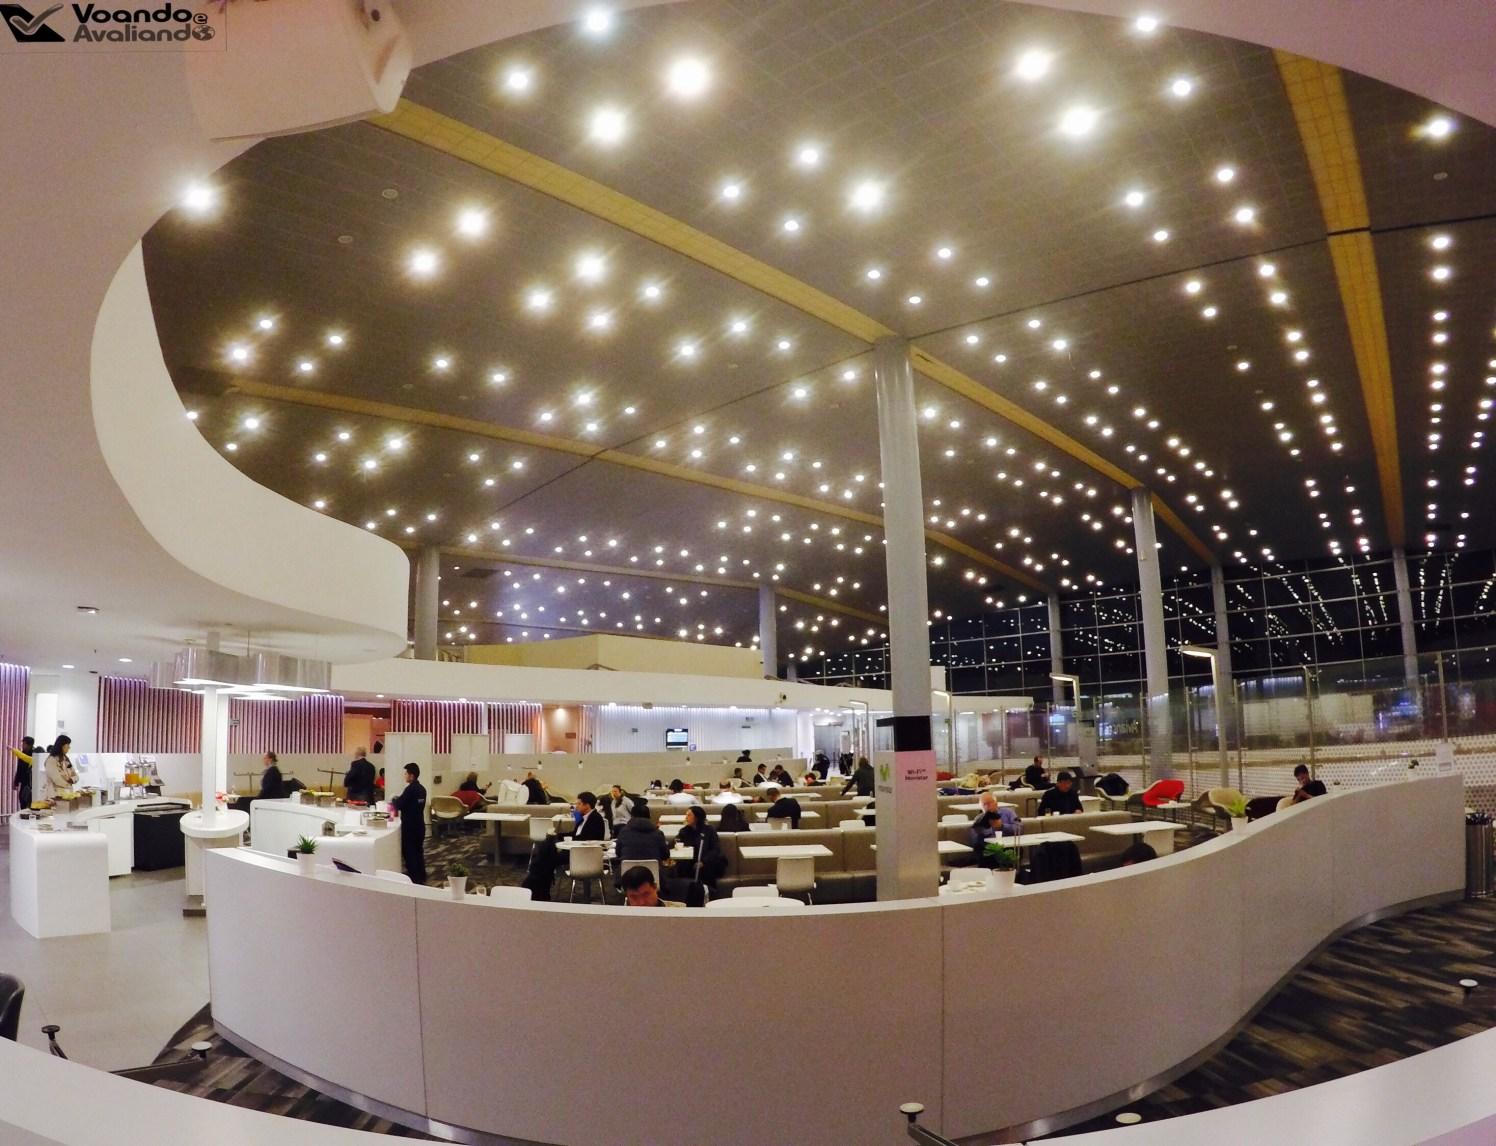 Sala VIP Avianca - Visão Geral 1